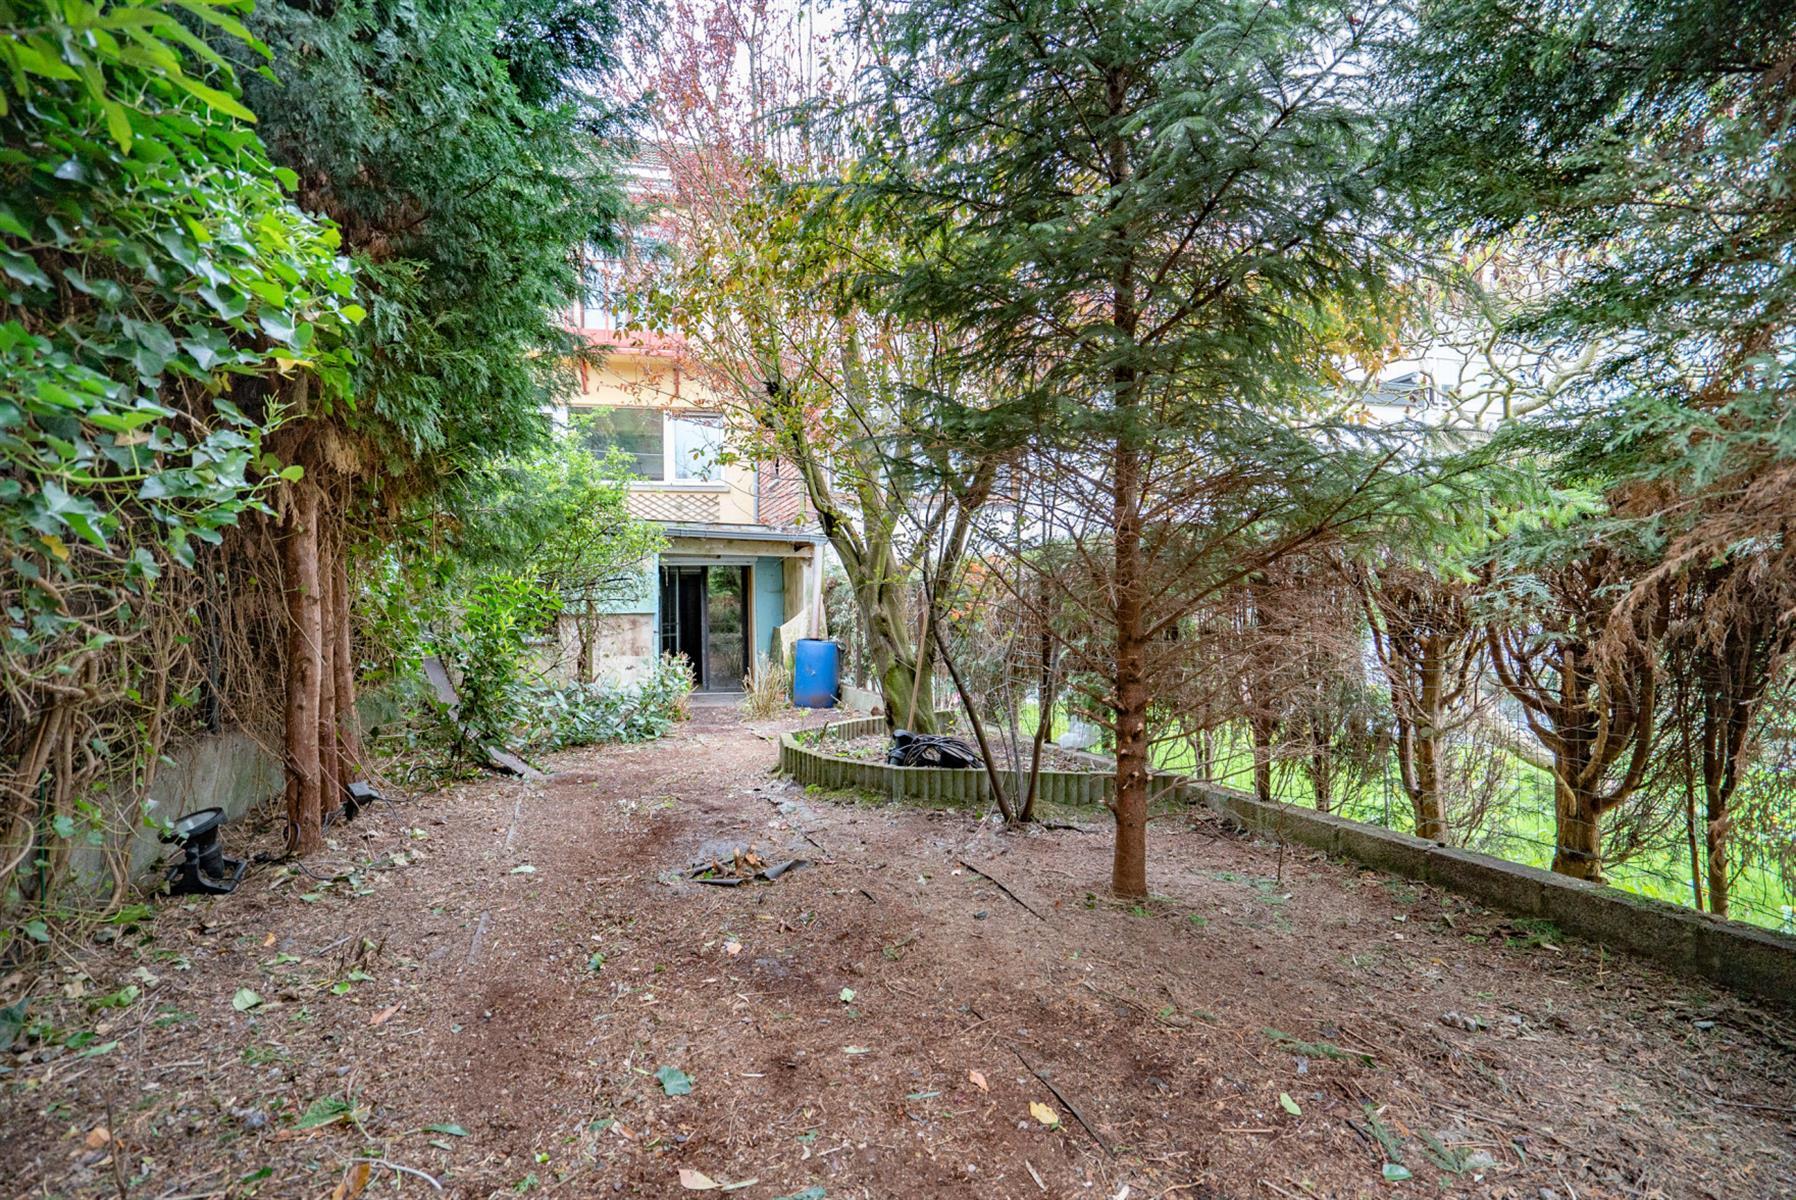 Maison - Saint-nicolas - #4357054-20